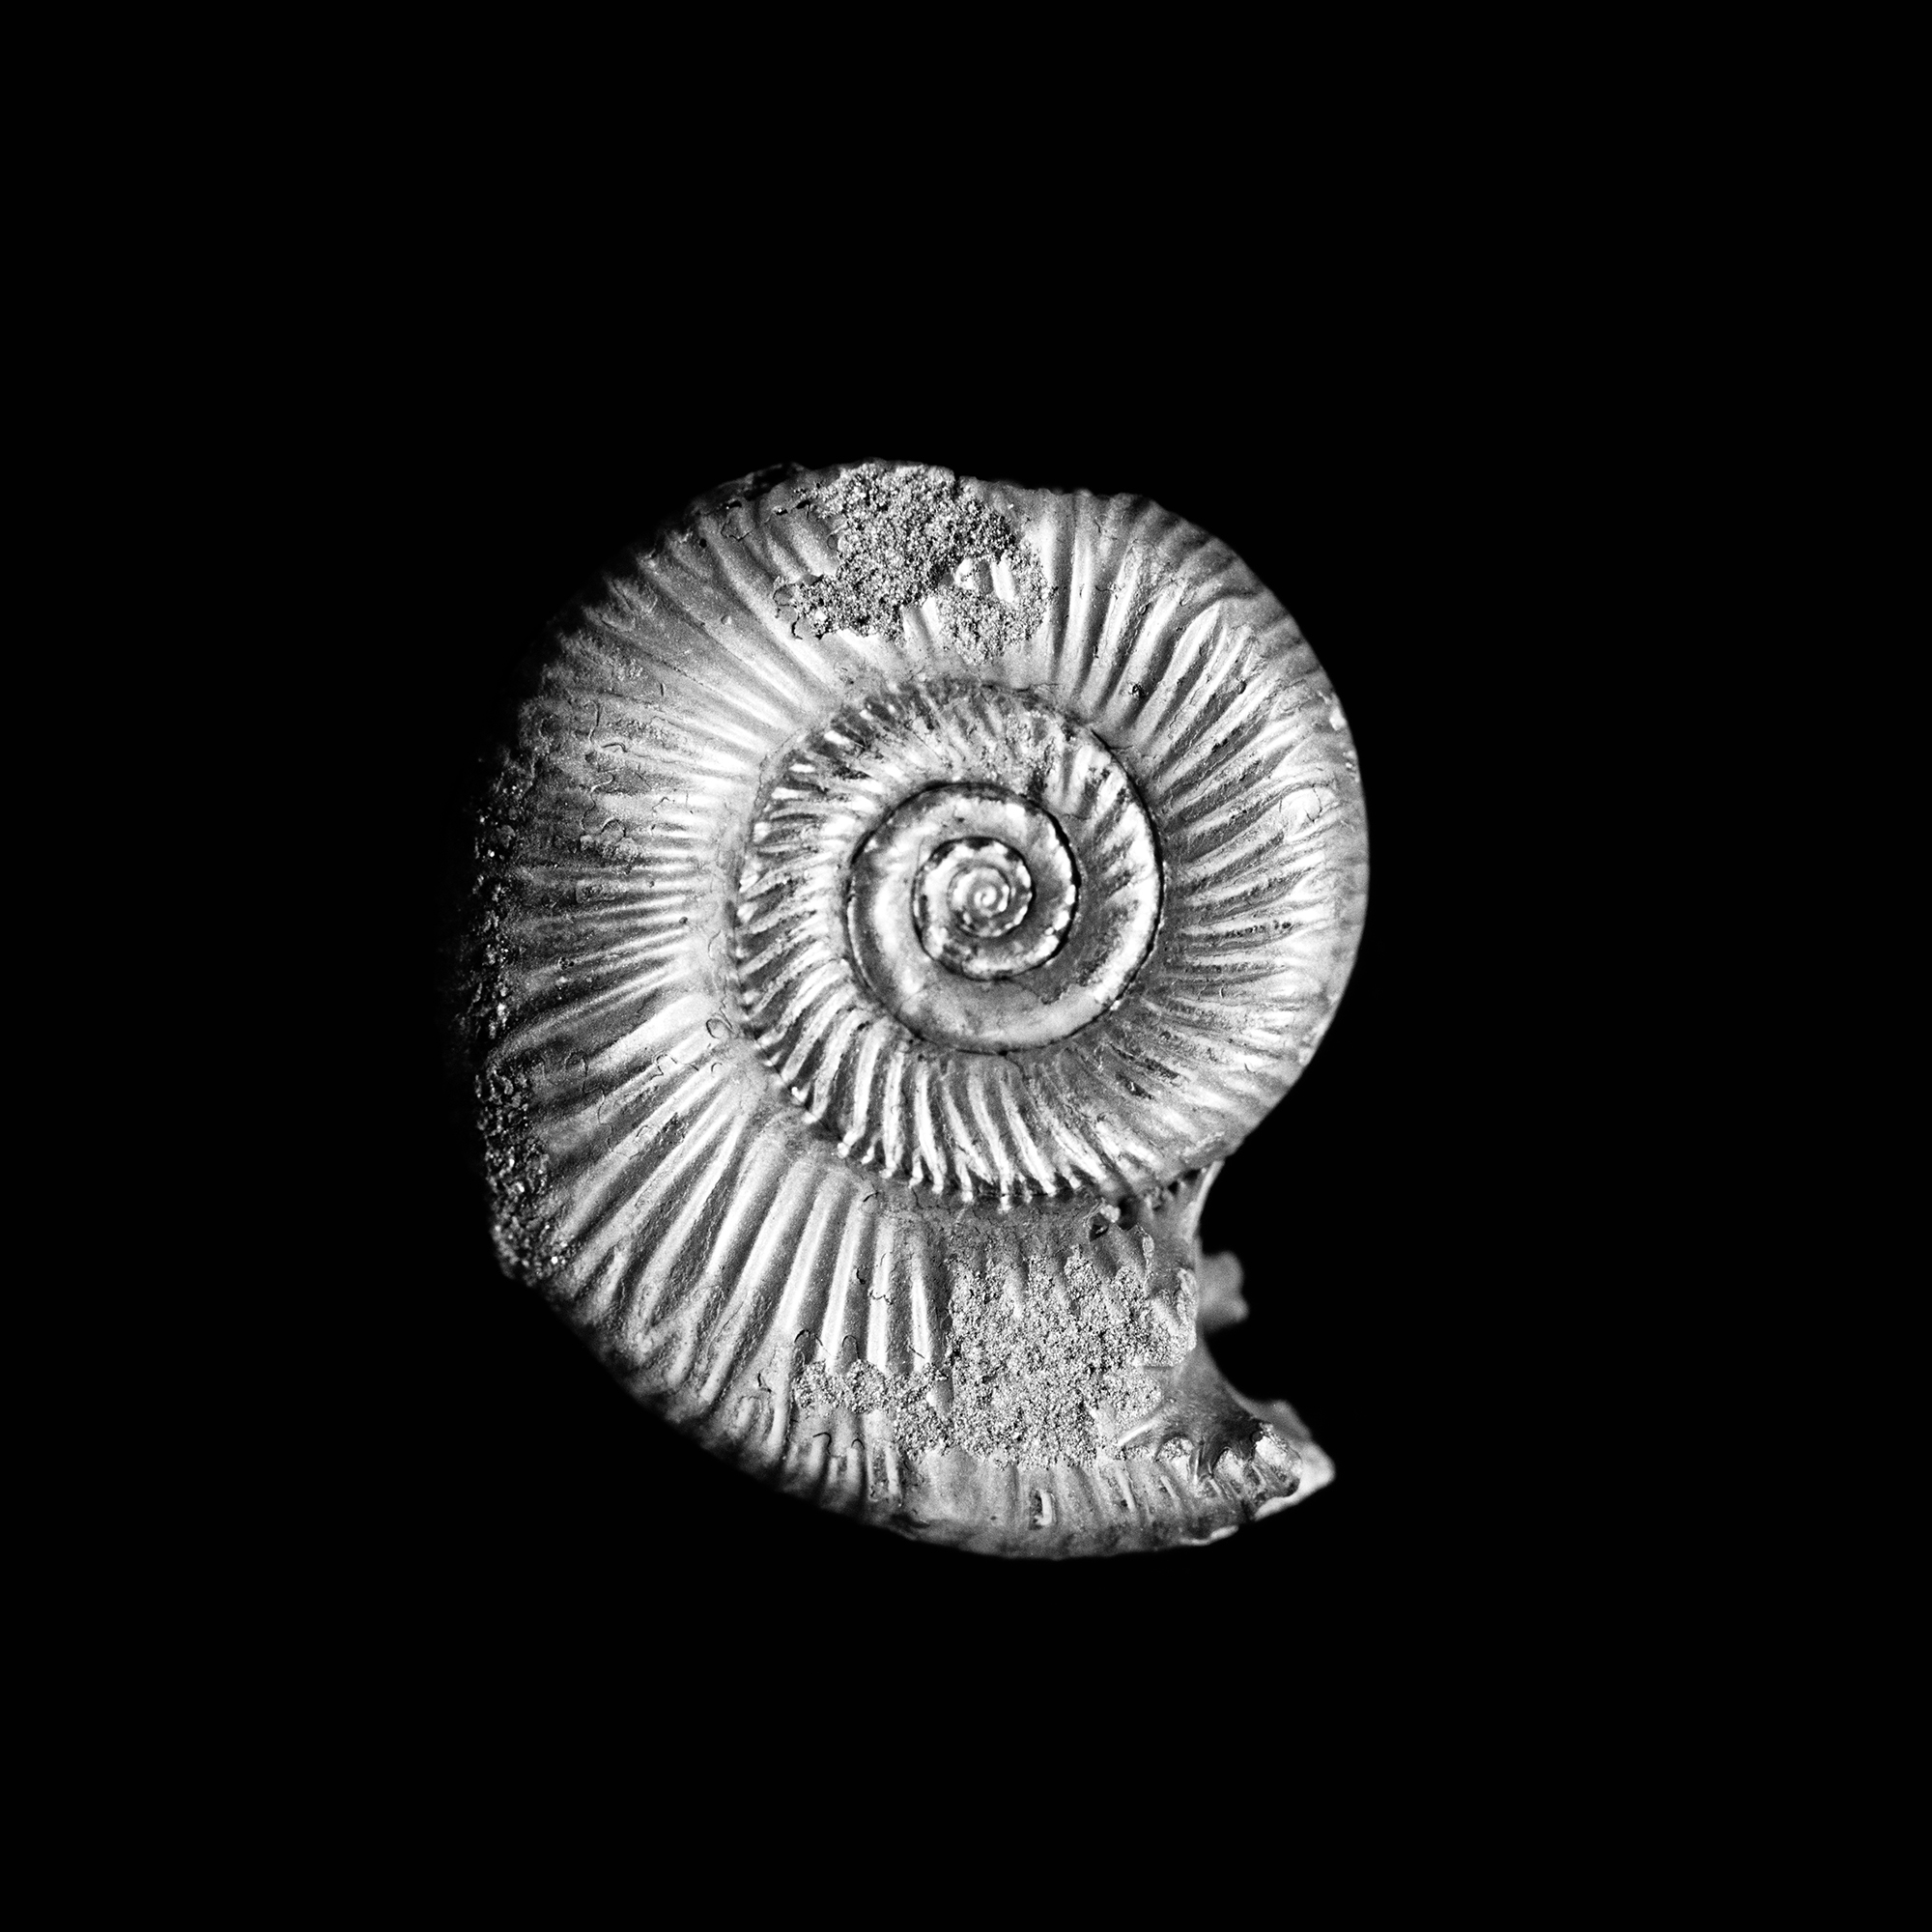 Binatisphnctes mosquensis, Lahusen, Jura, Rjasan, Moskau